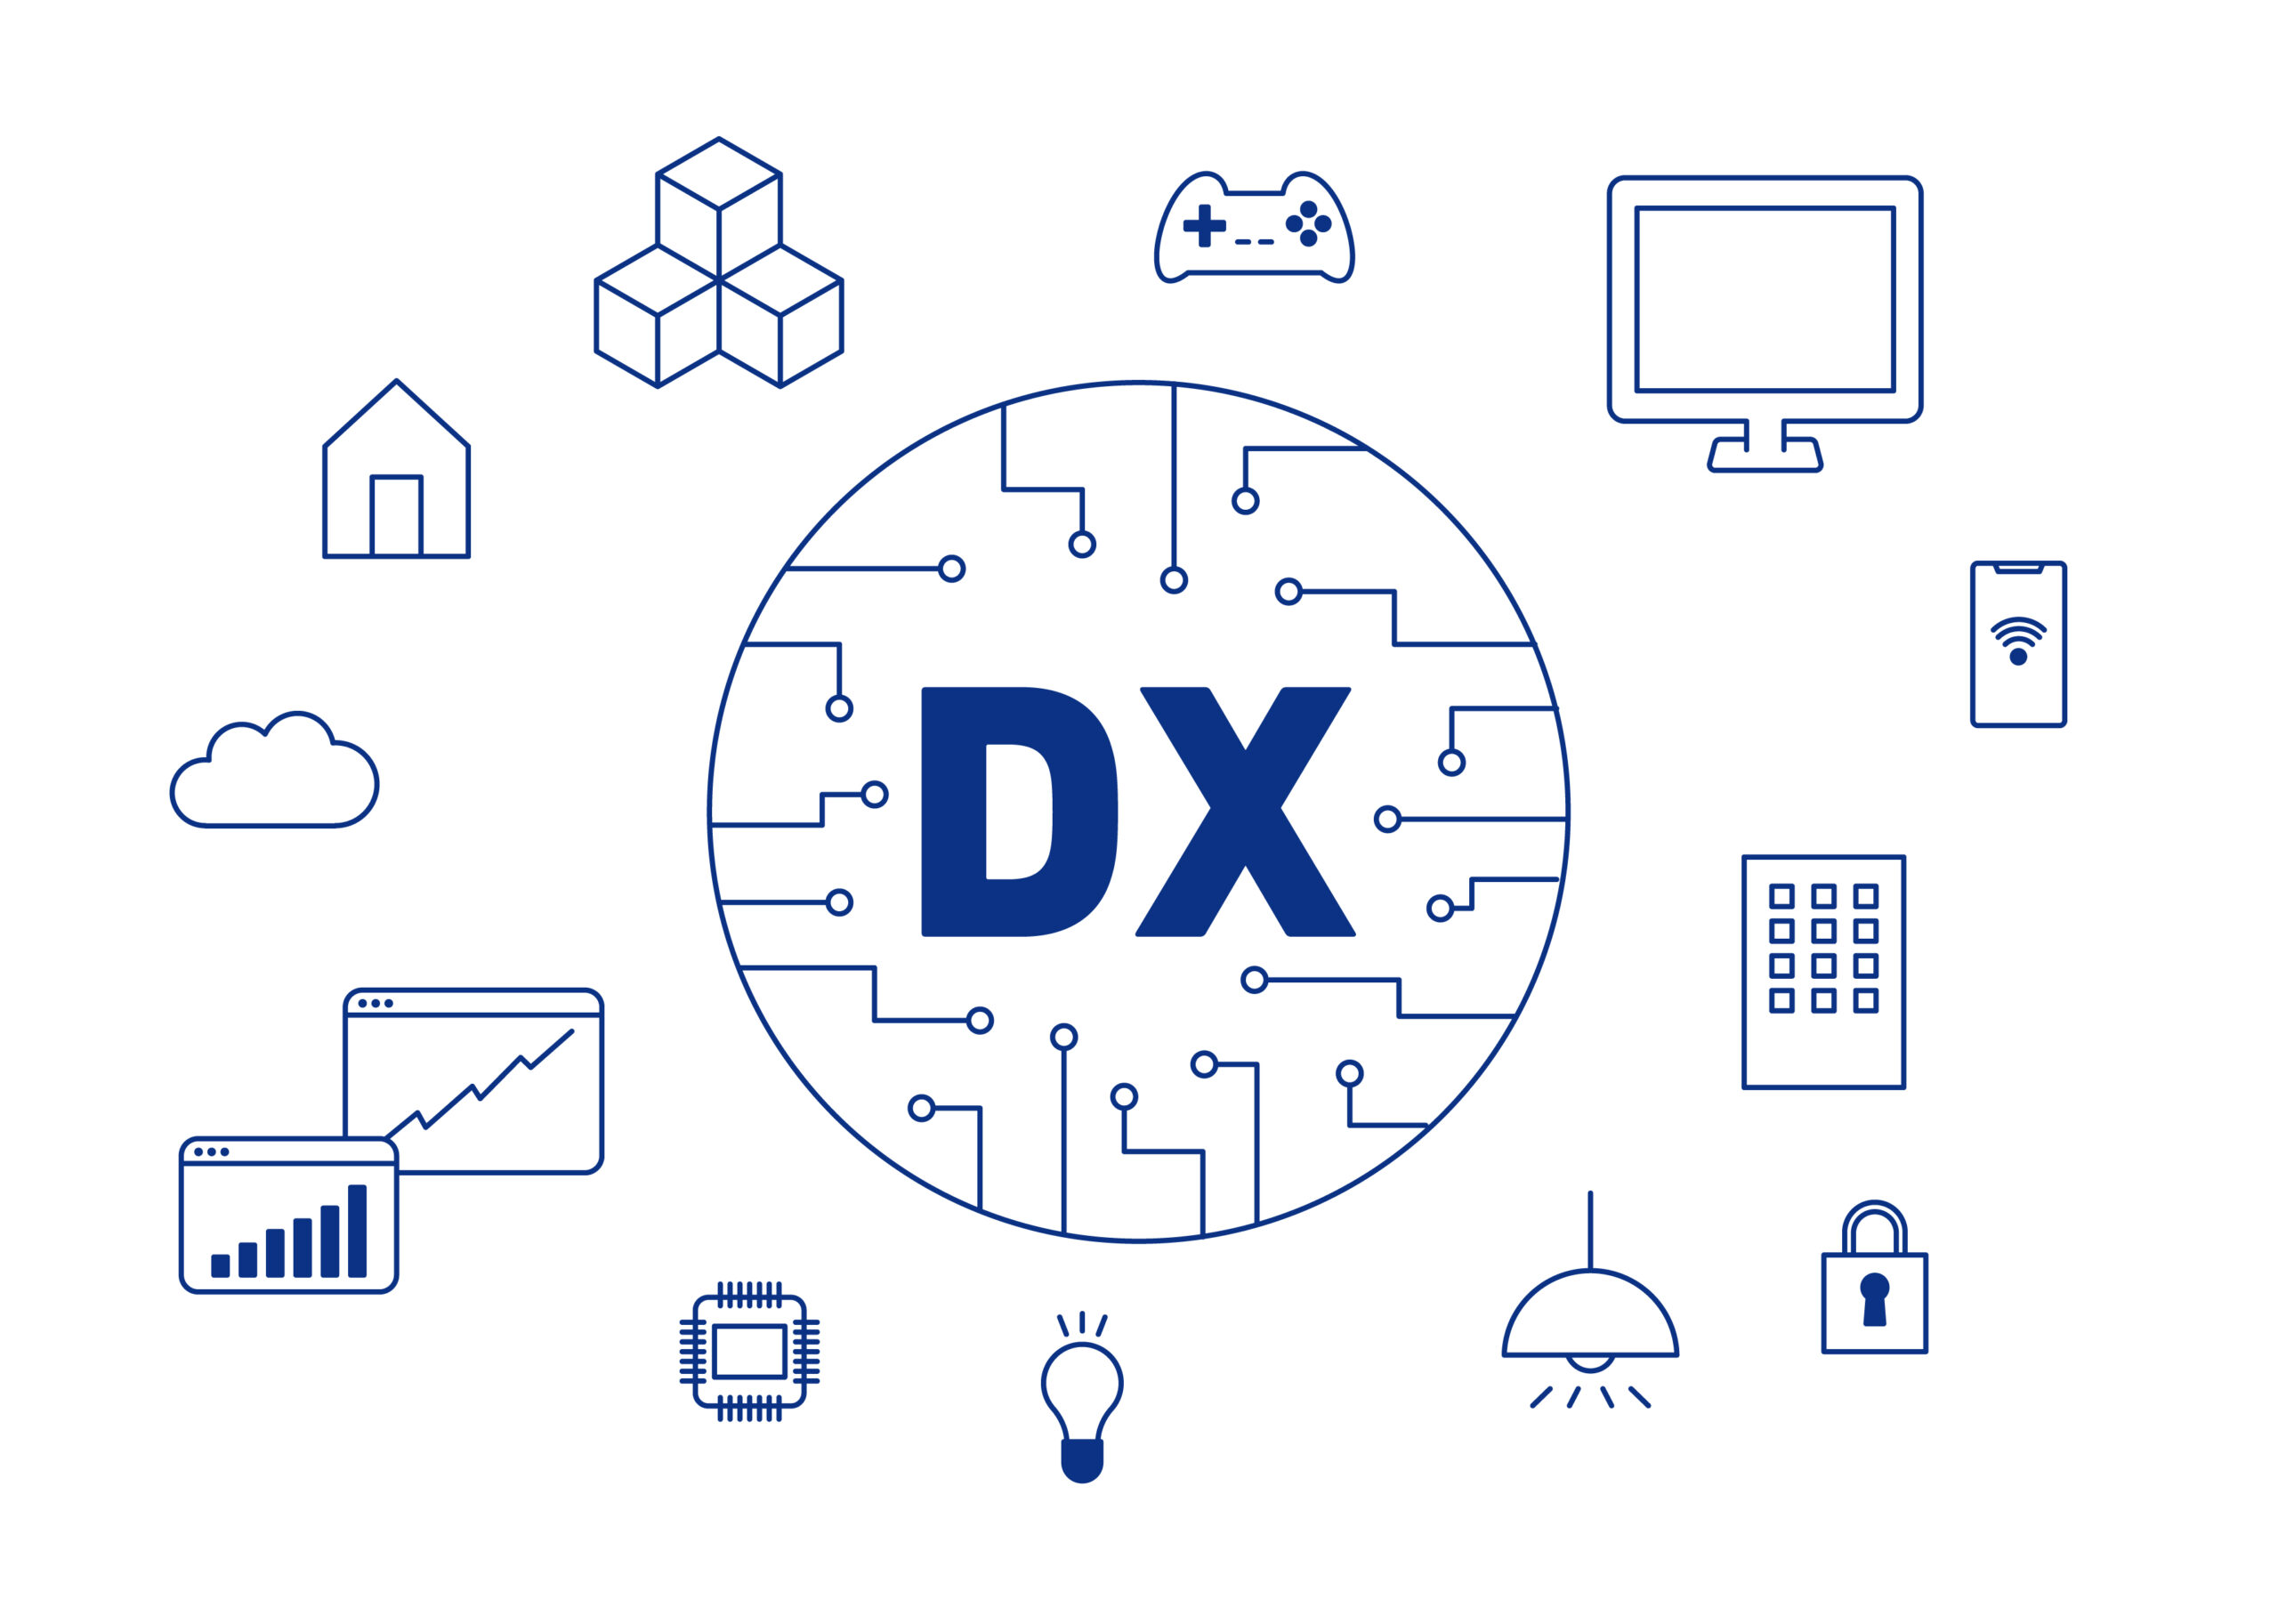 【DX推進】社内でDX体制を整えるために必要な仕組みと人選とは?